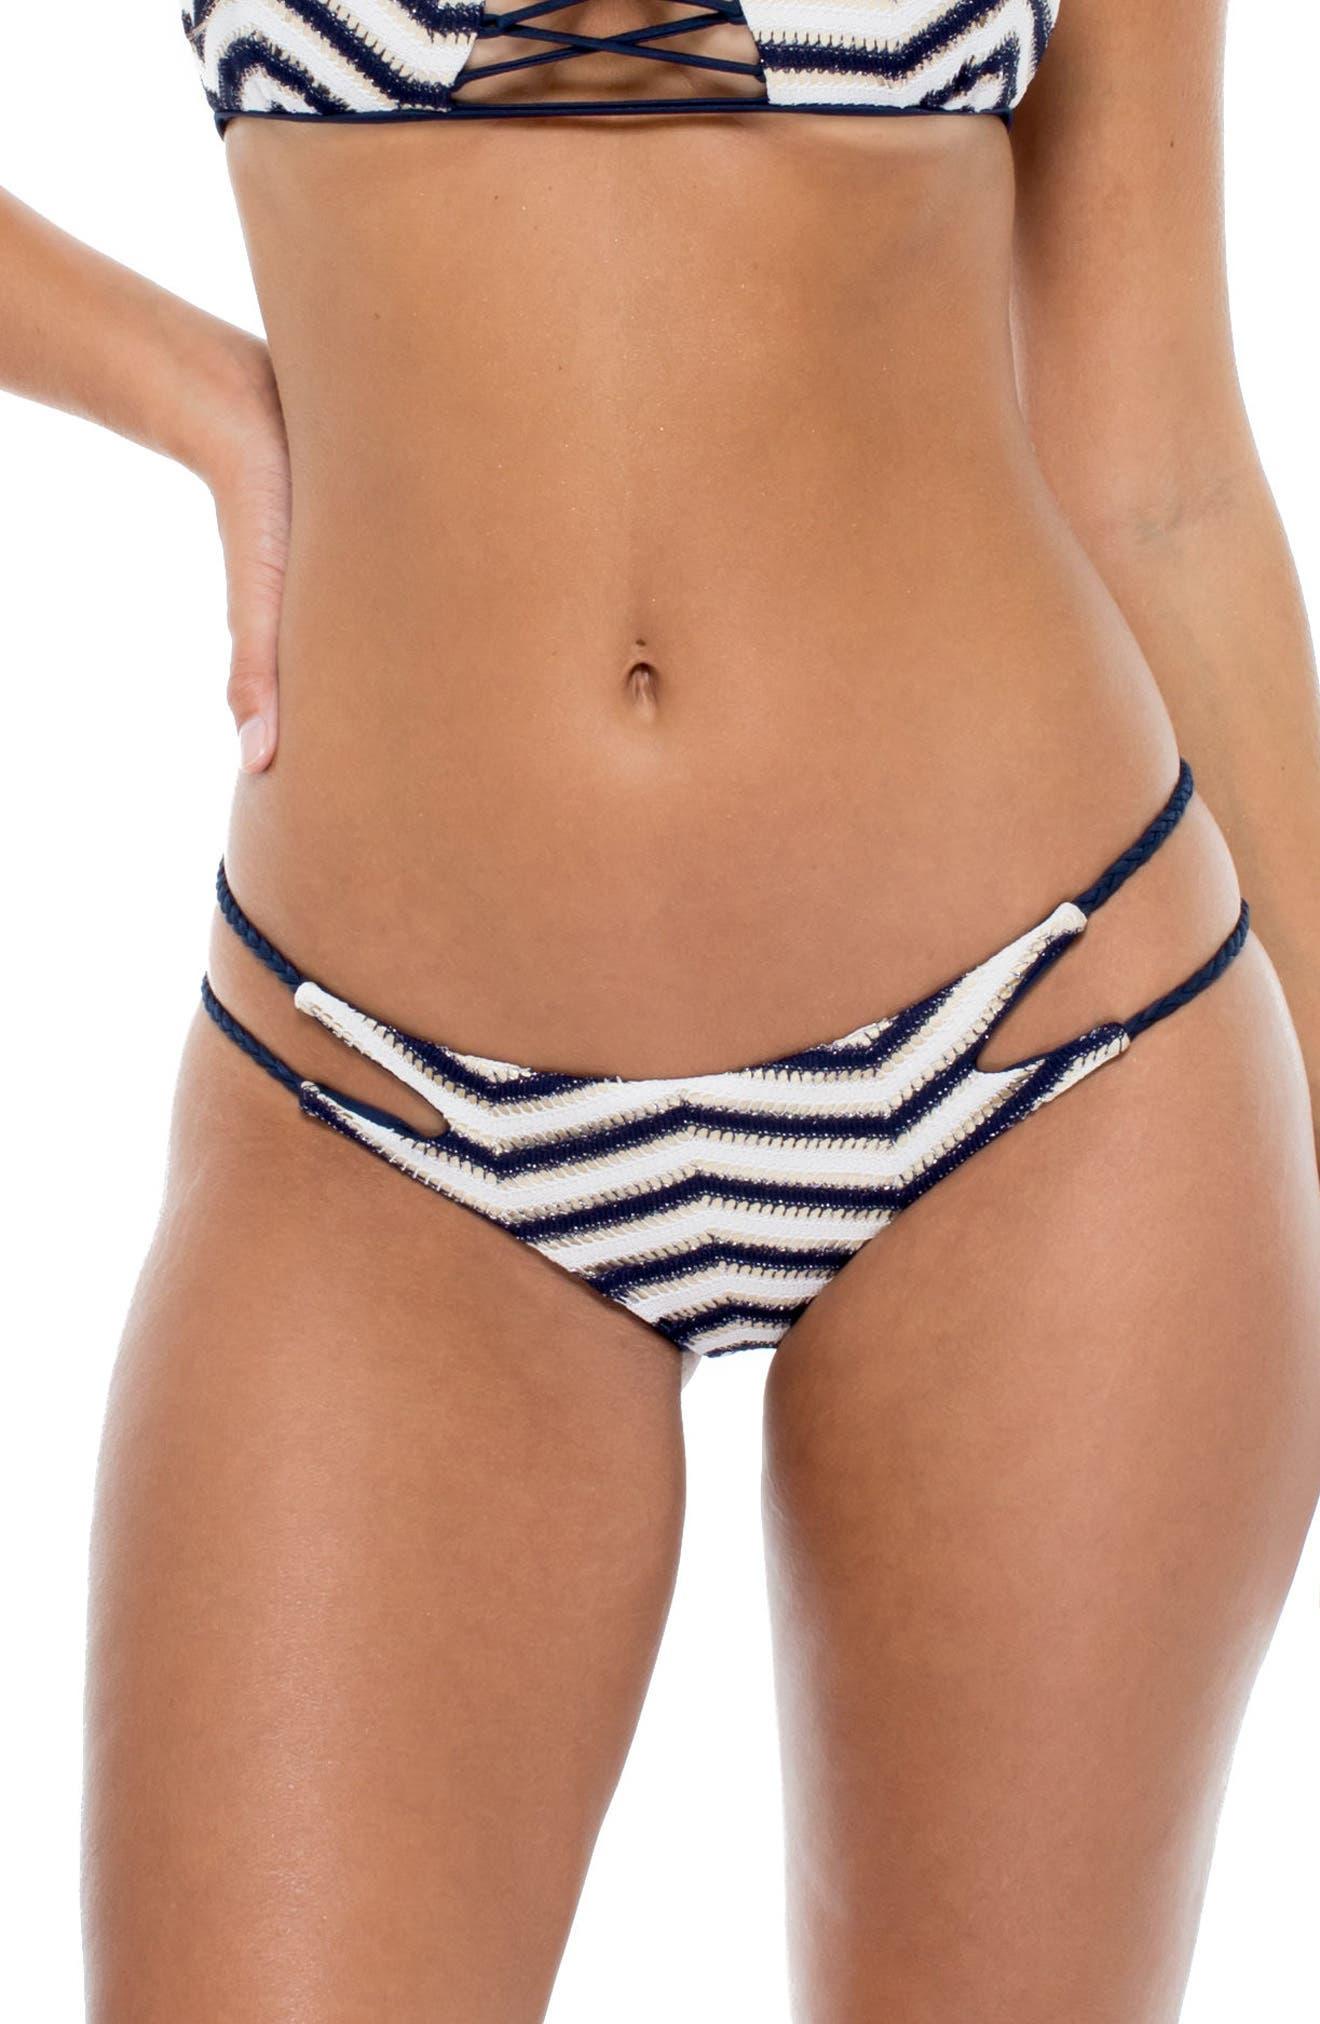 Varadero Bikini Bottoms,                             Main thumbnail 1, color,